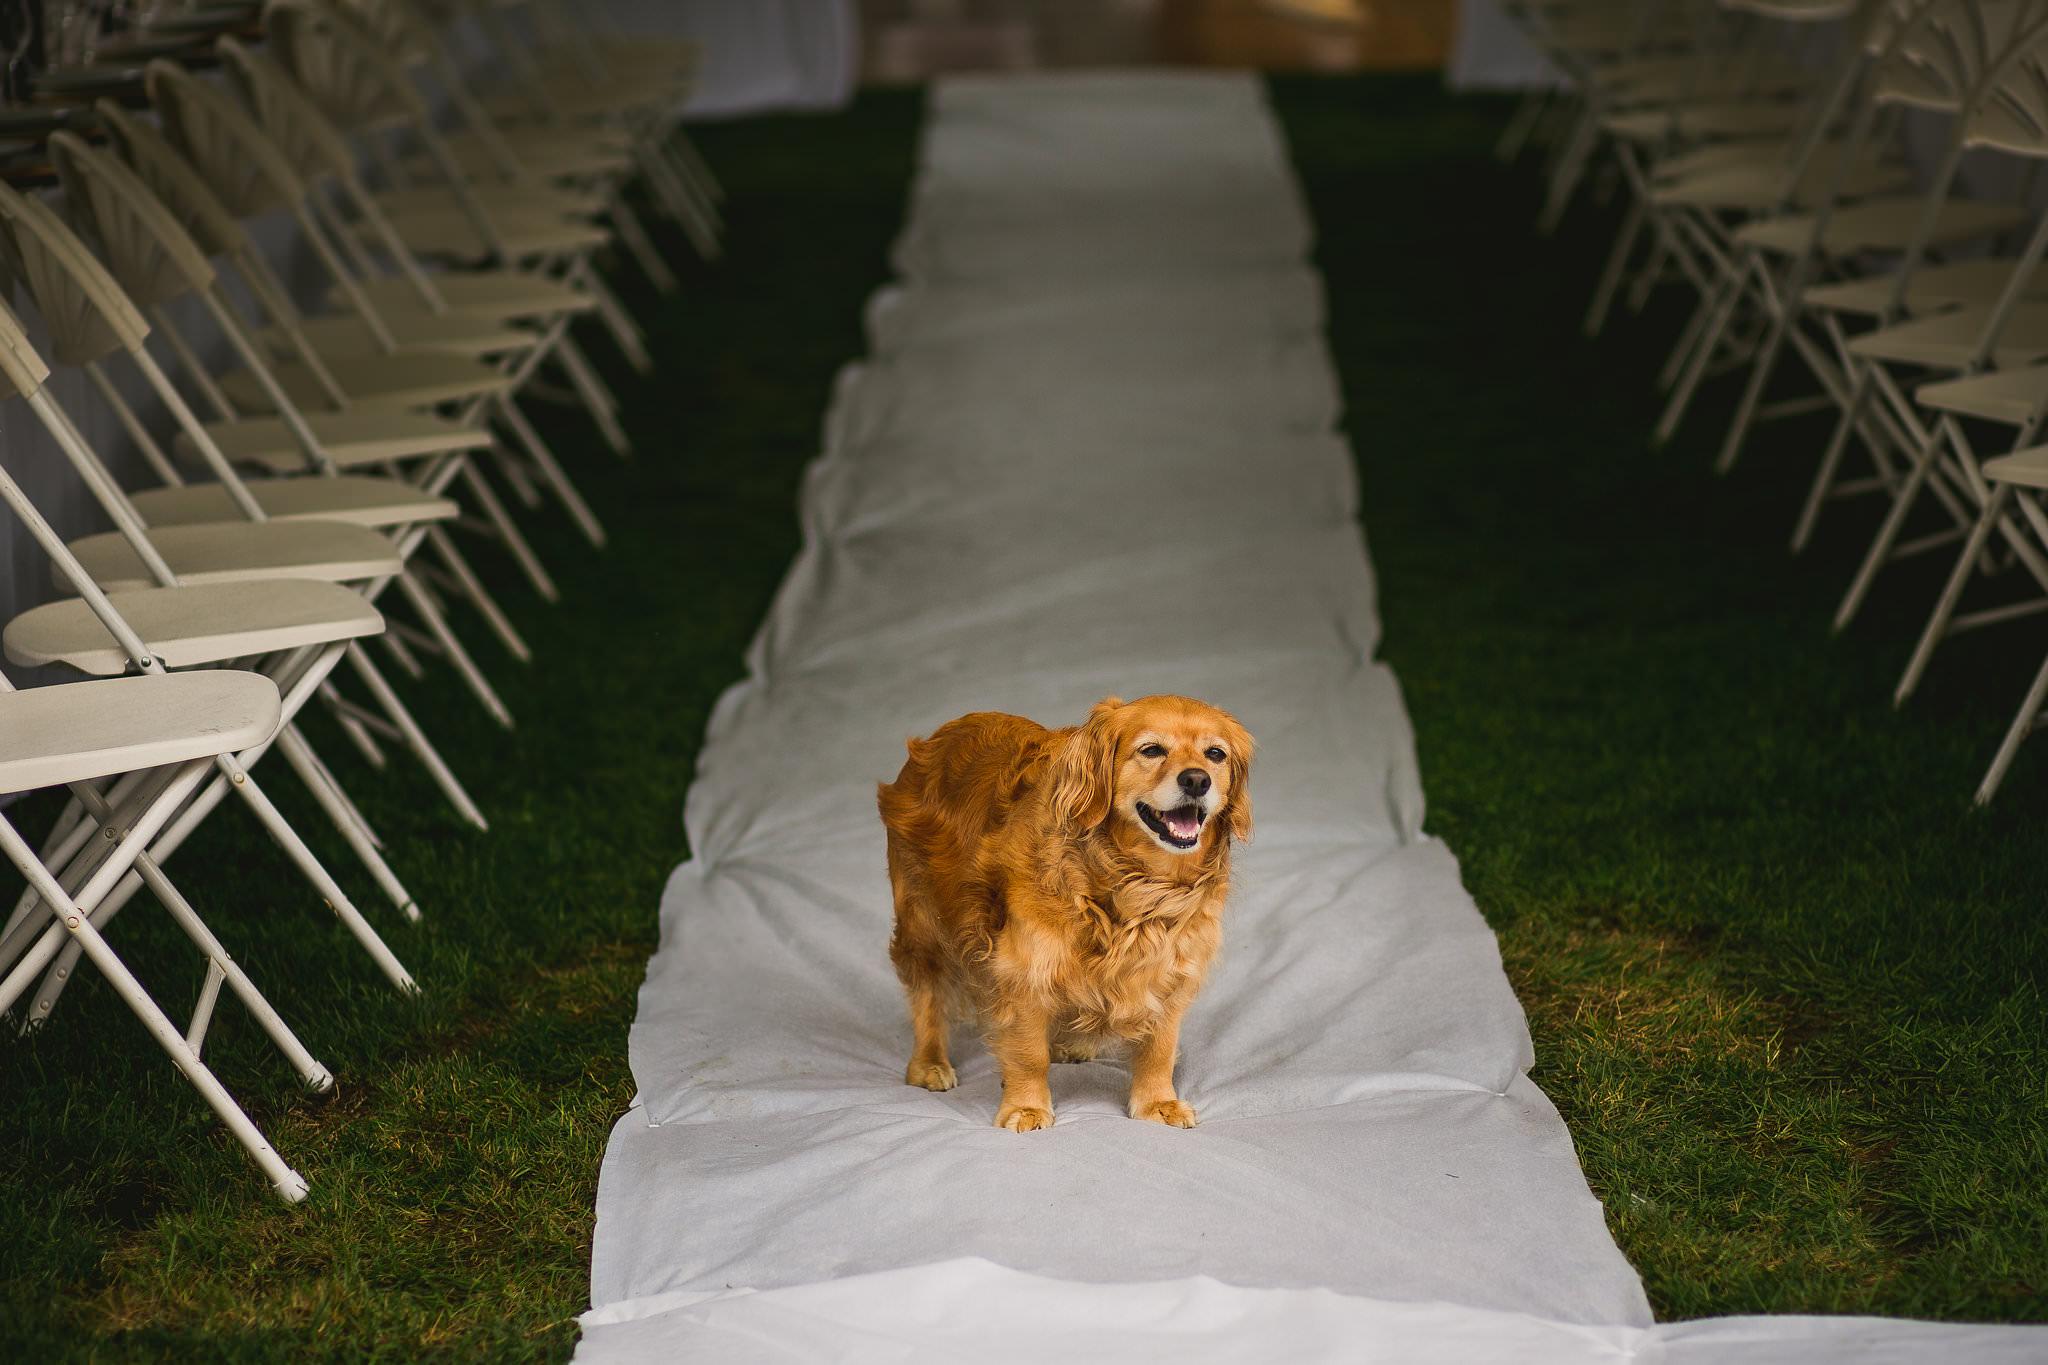 Kristen Adam Kindred Loft Whitby Wedding Photos 94 - Durham Wedding Photographer: Kindred Loft Wedding Photos